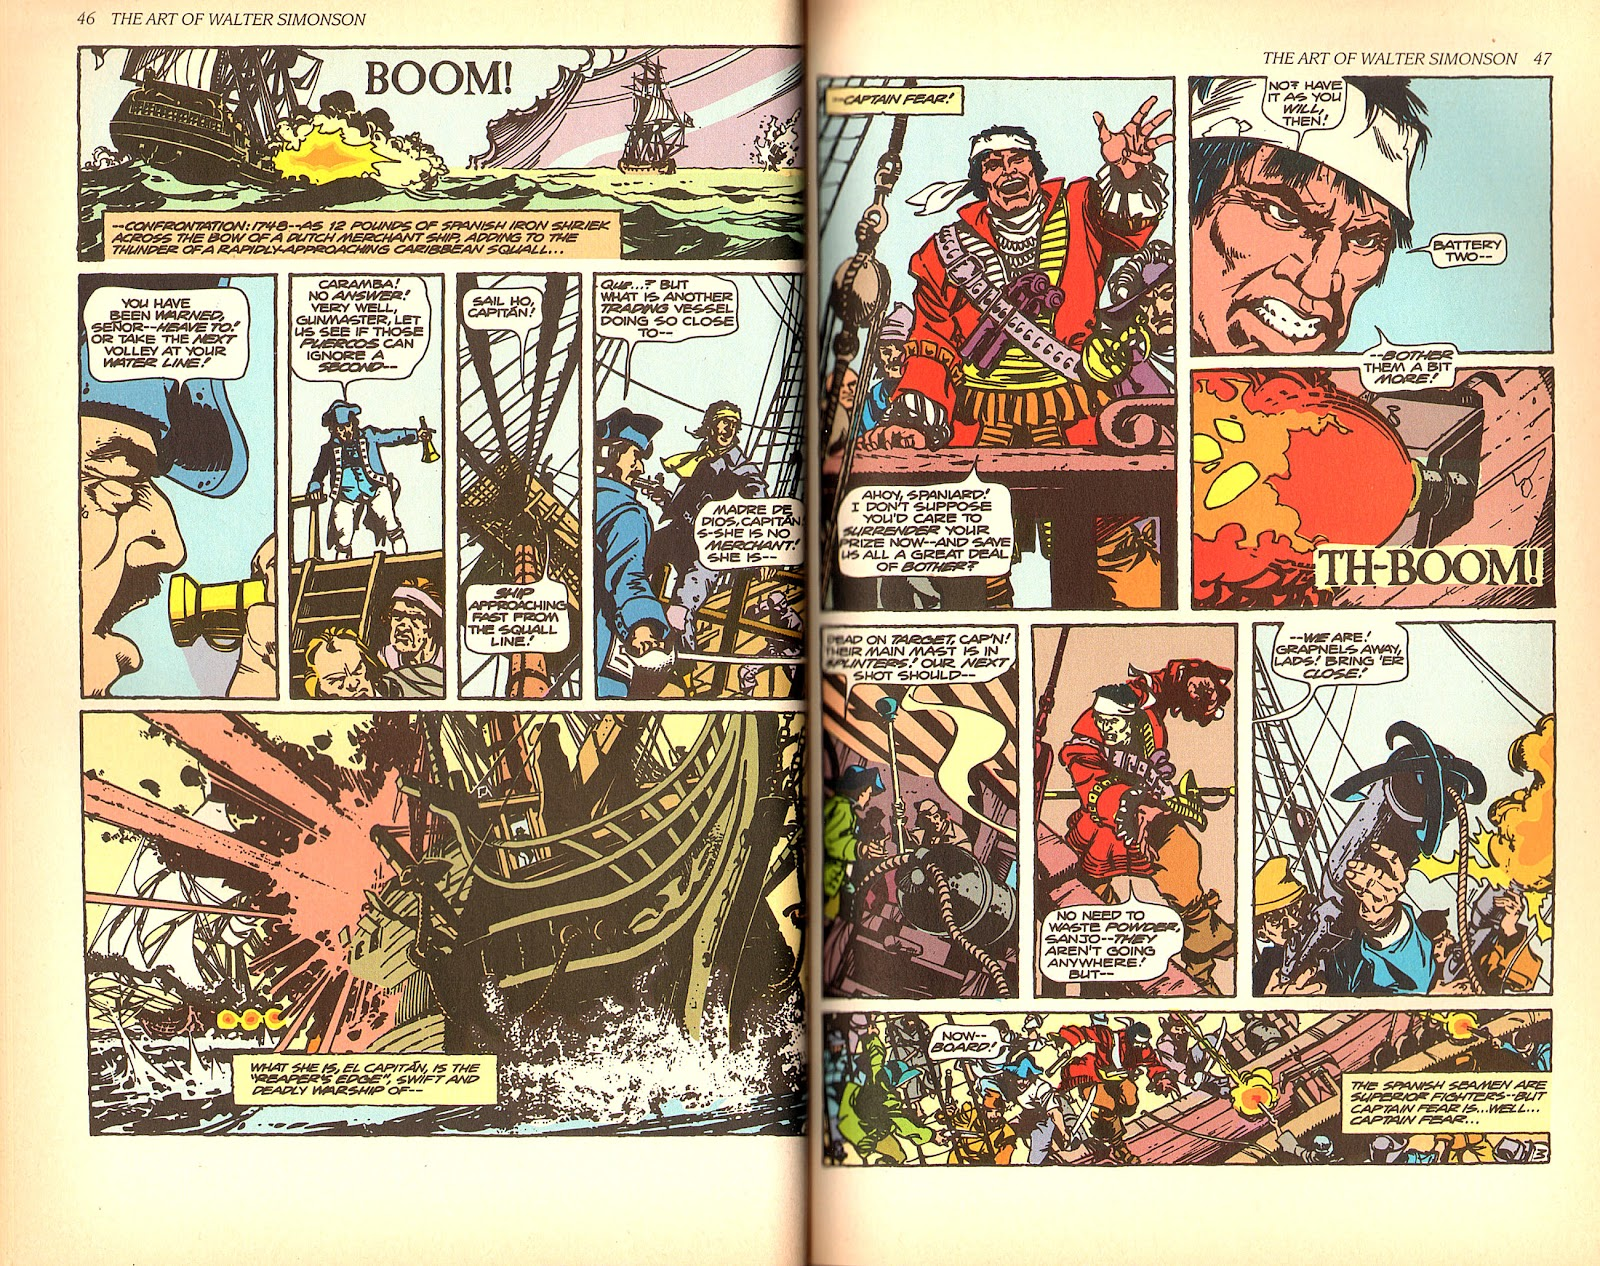 Read online The Art of Walter Simonson comic -  Issue # TPB - 25